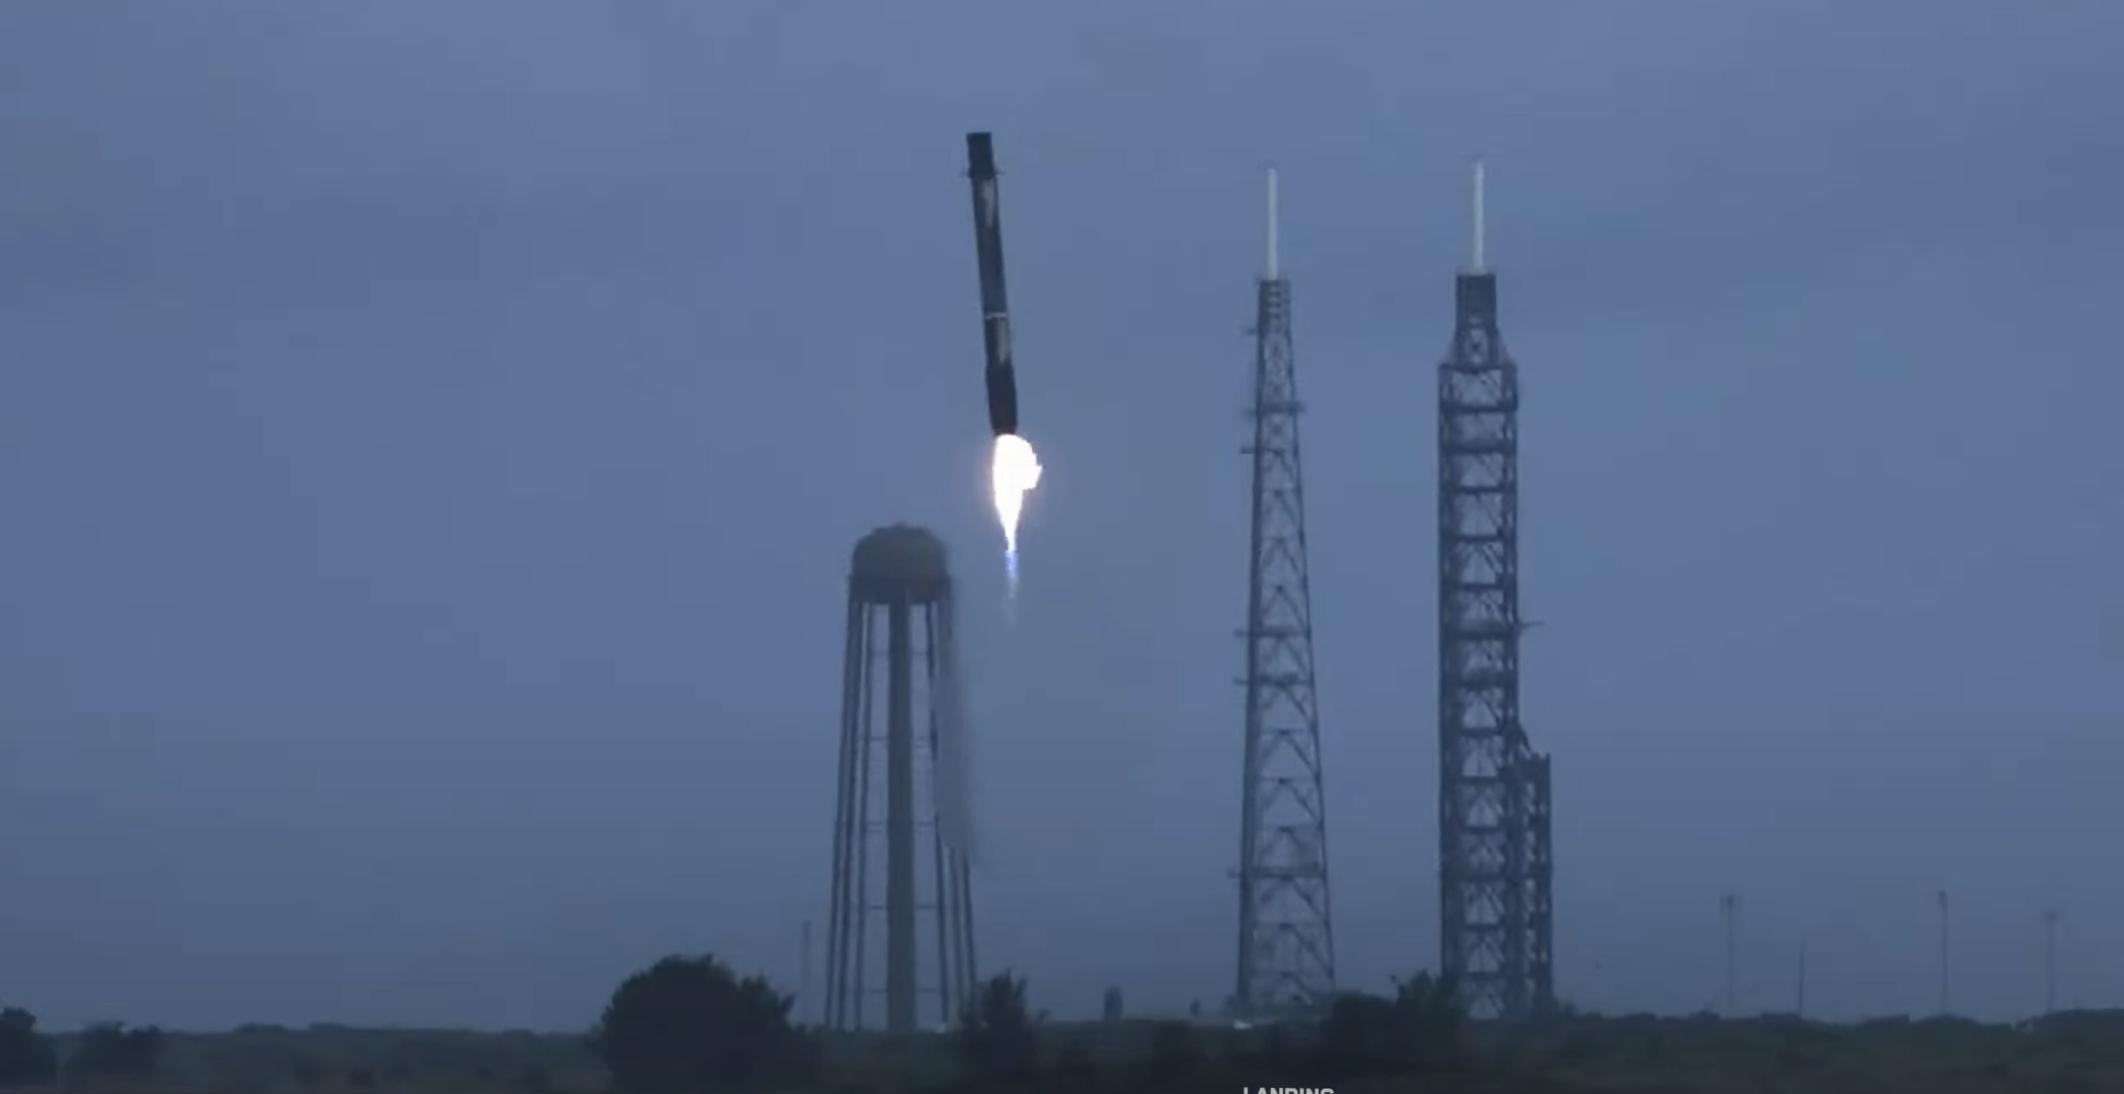 Transporter-2 Falcon 9 B1060 063021 webcast (SpaceX) landing + LC-36 1 crop